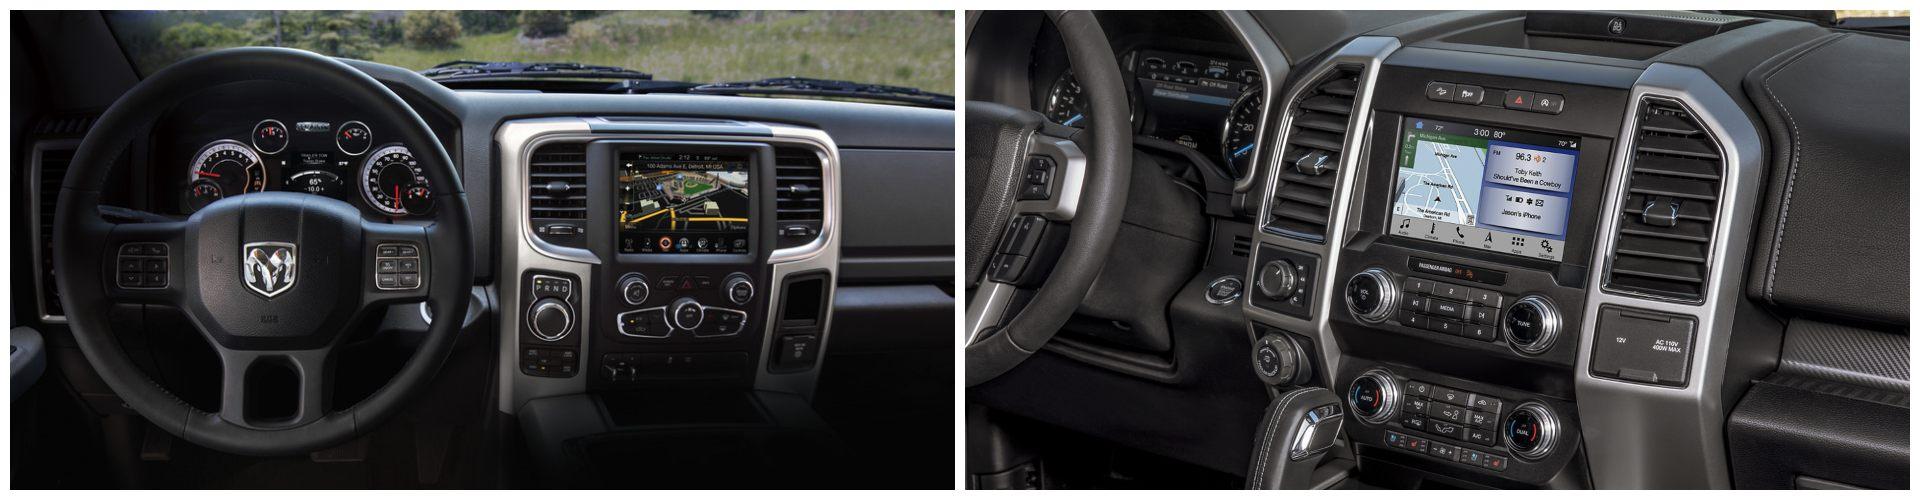 2020 RAM 1500 vs 2020 Ford F-150 Interior